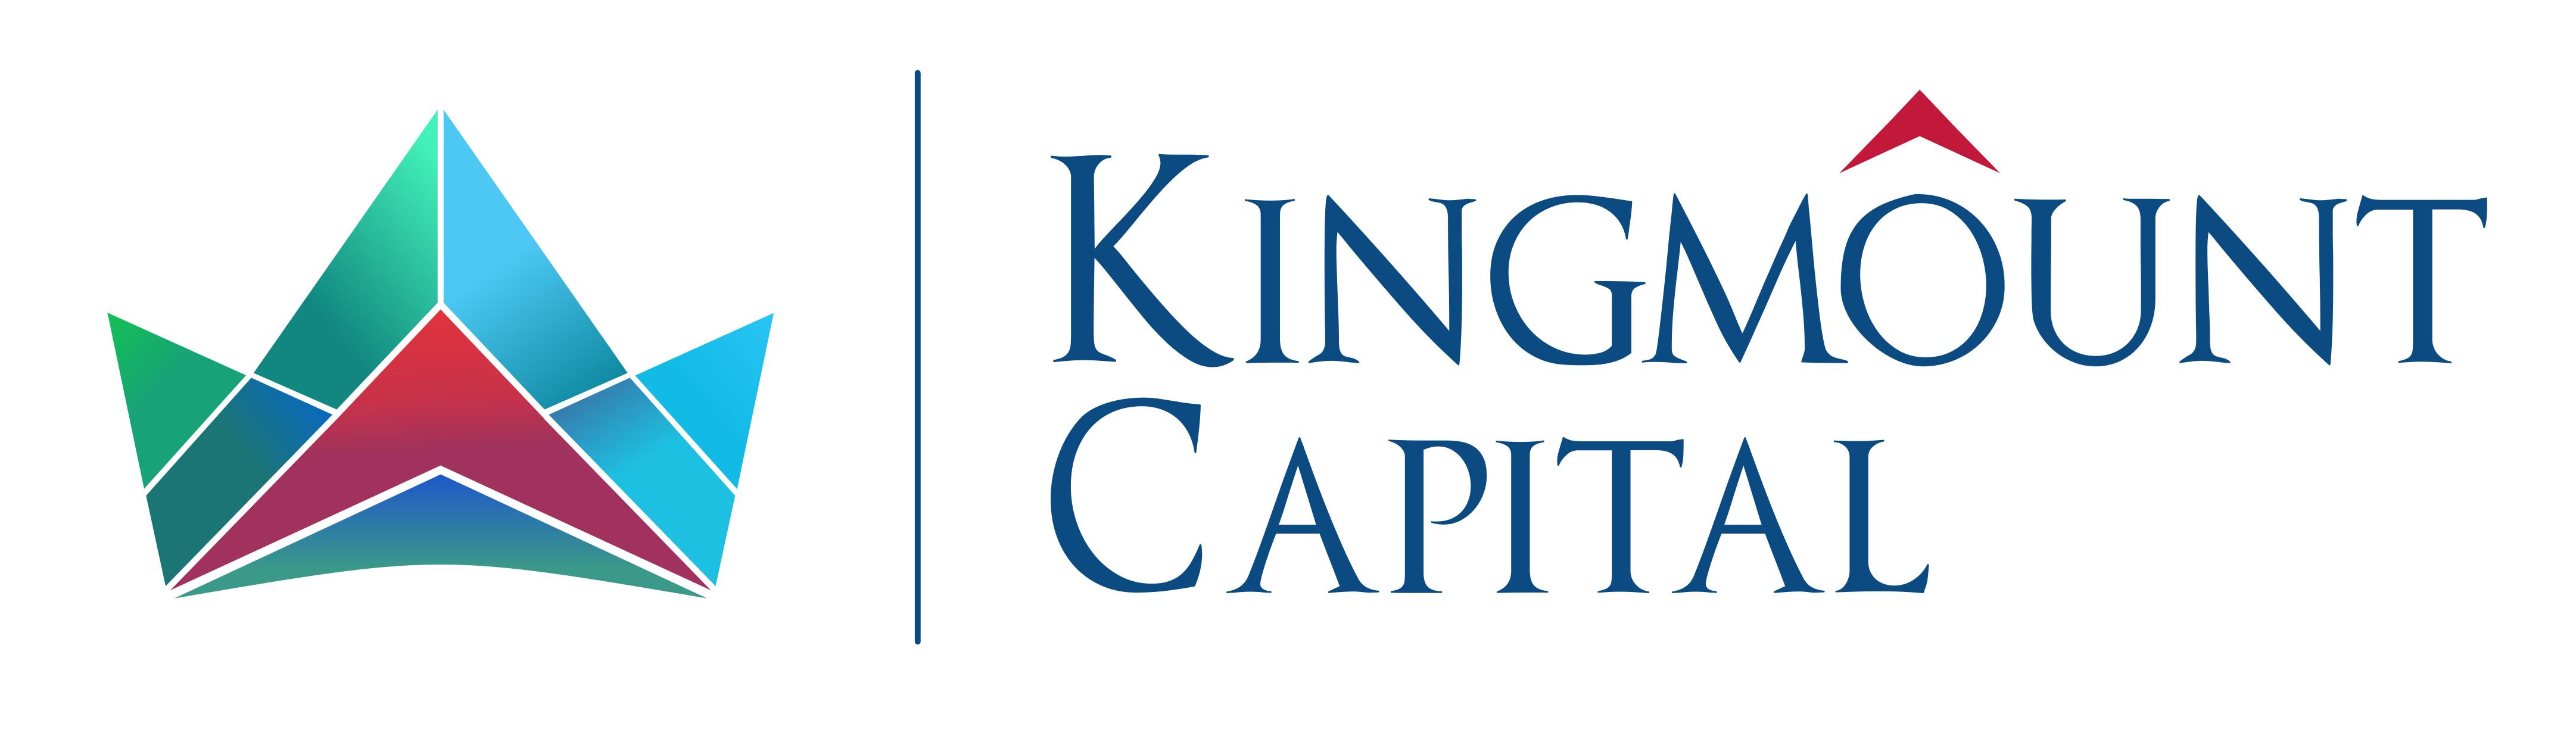 kingmountcapital_logo